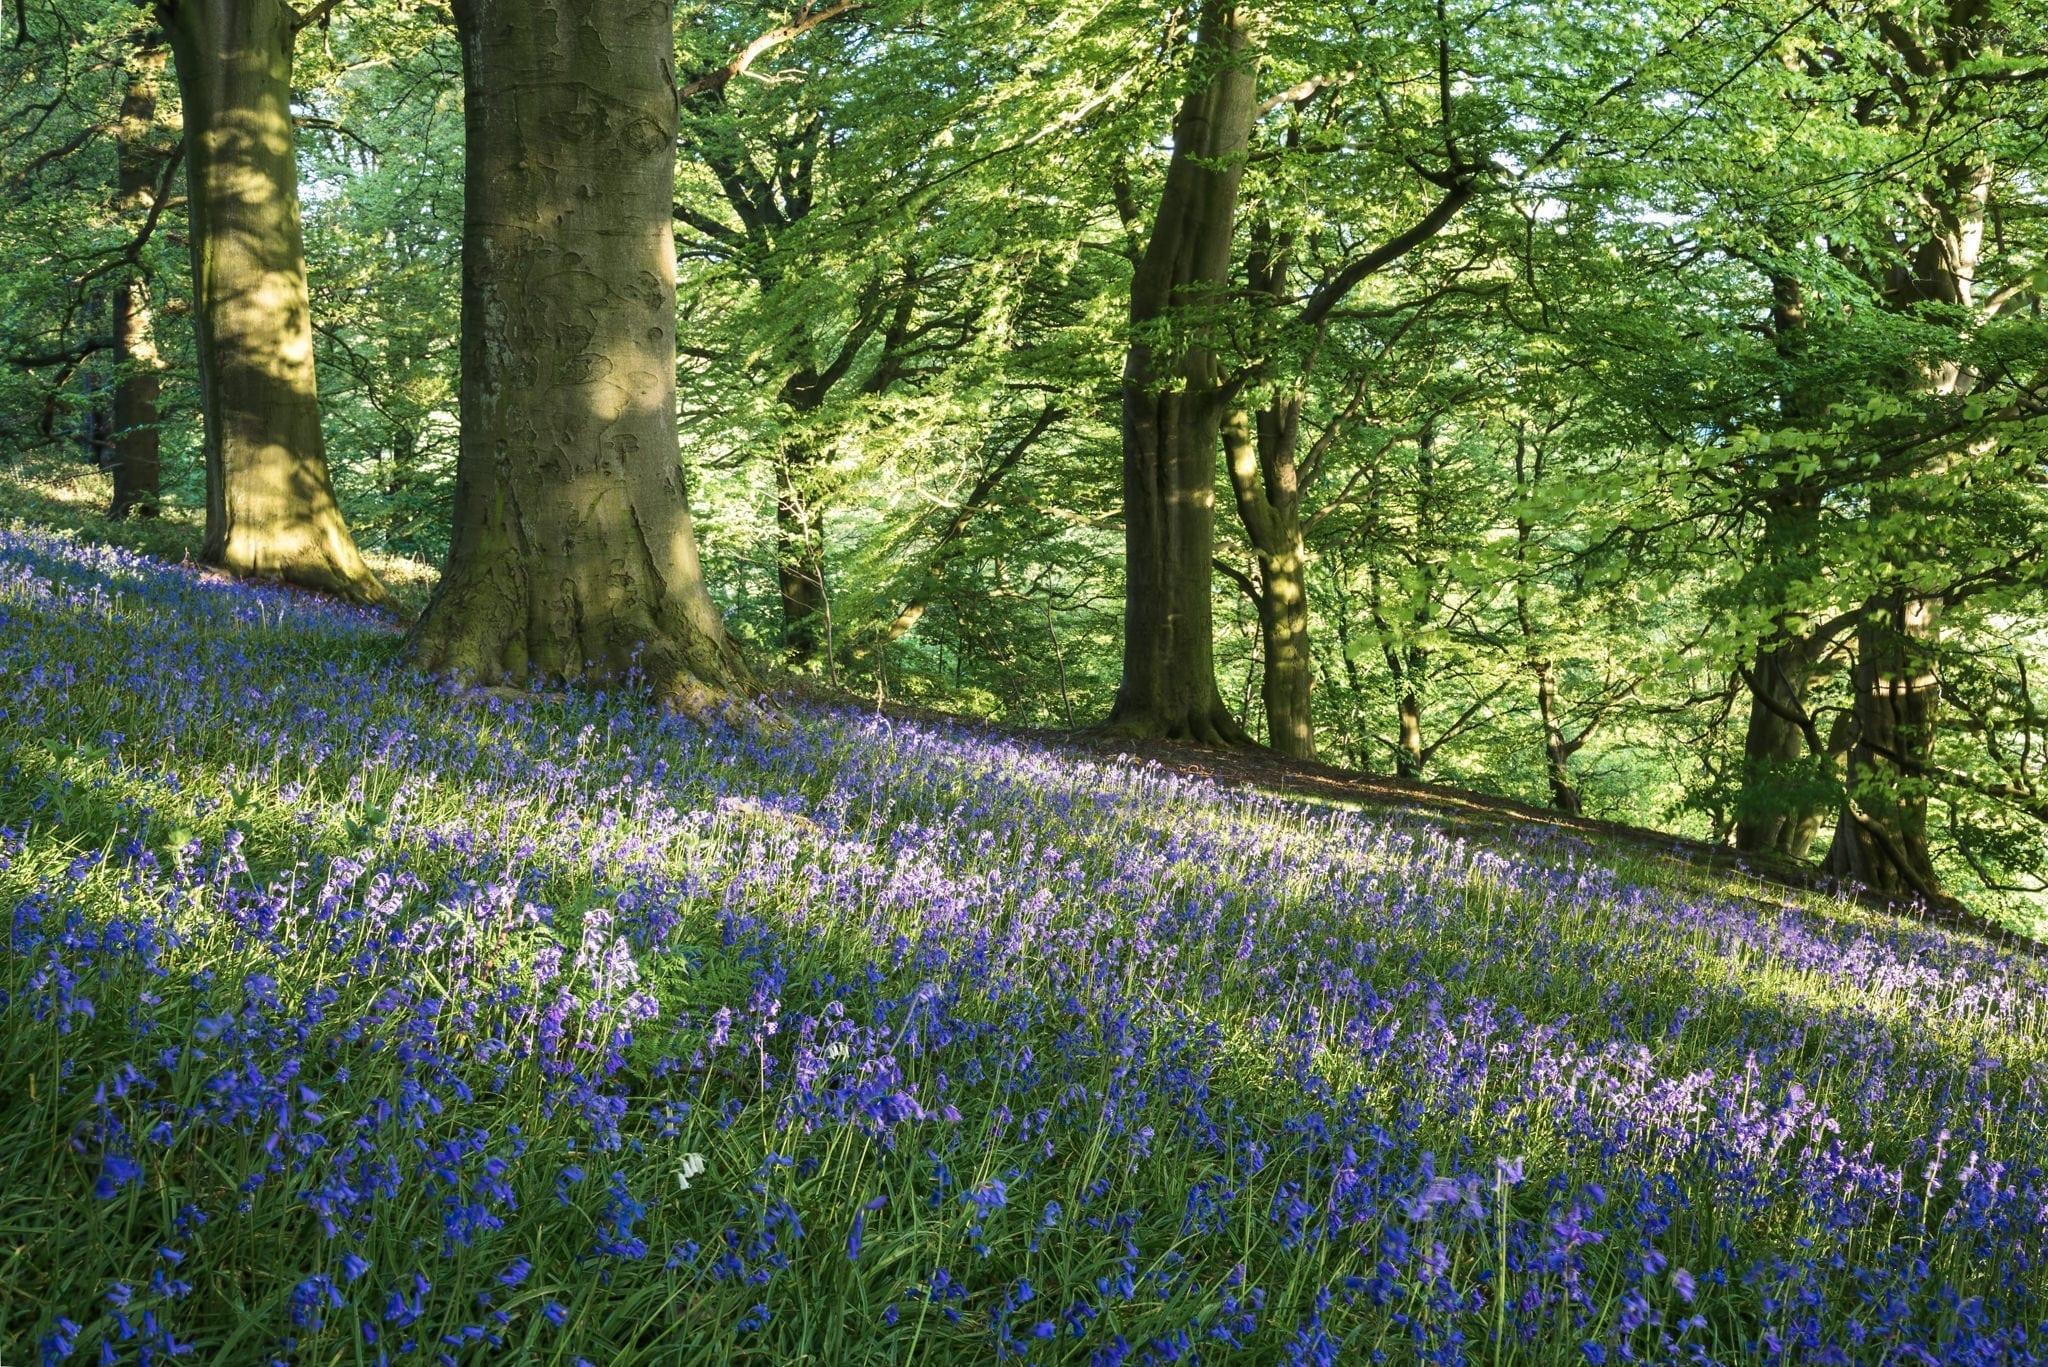 Bluebell Woods Sunset - Bluebells and Woodlands Photography Workshop